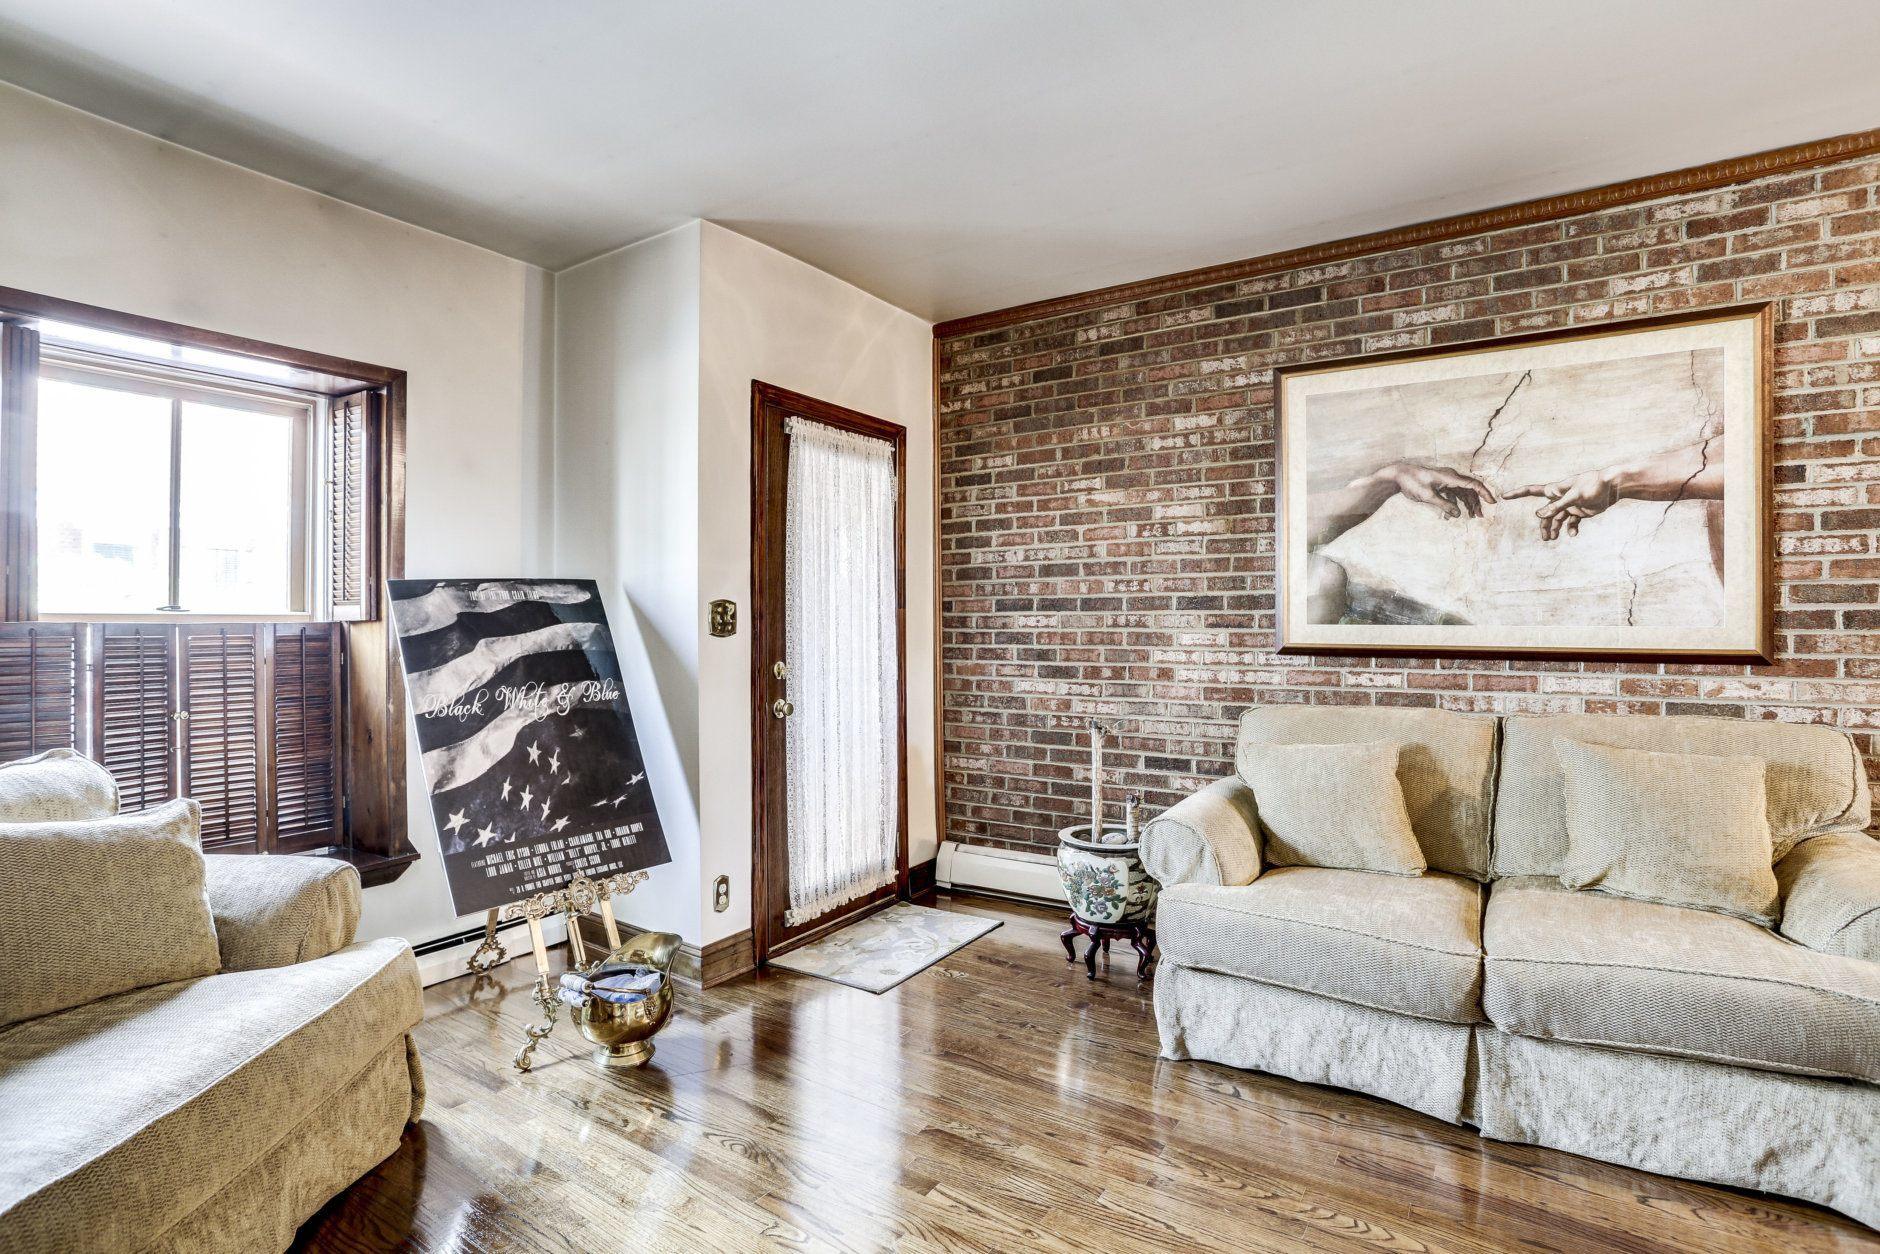 Ellington's former home boasts hardwood floors on each level. (Courtesy BTW Images)